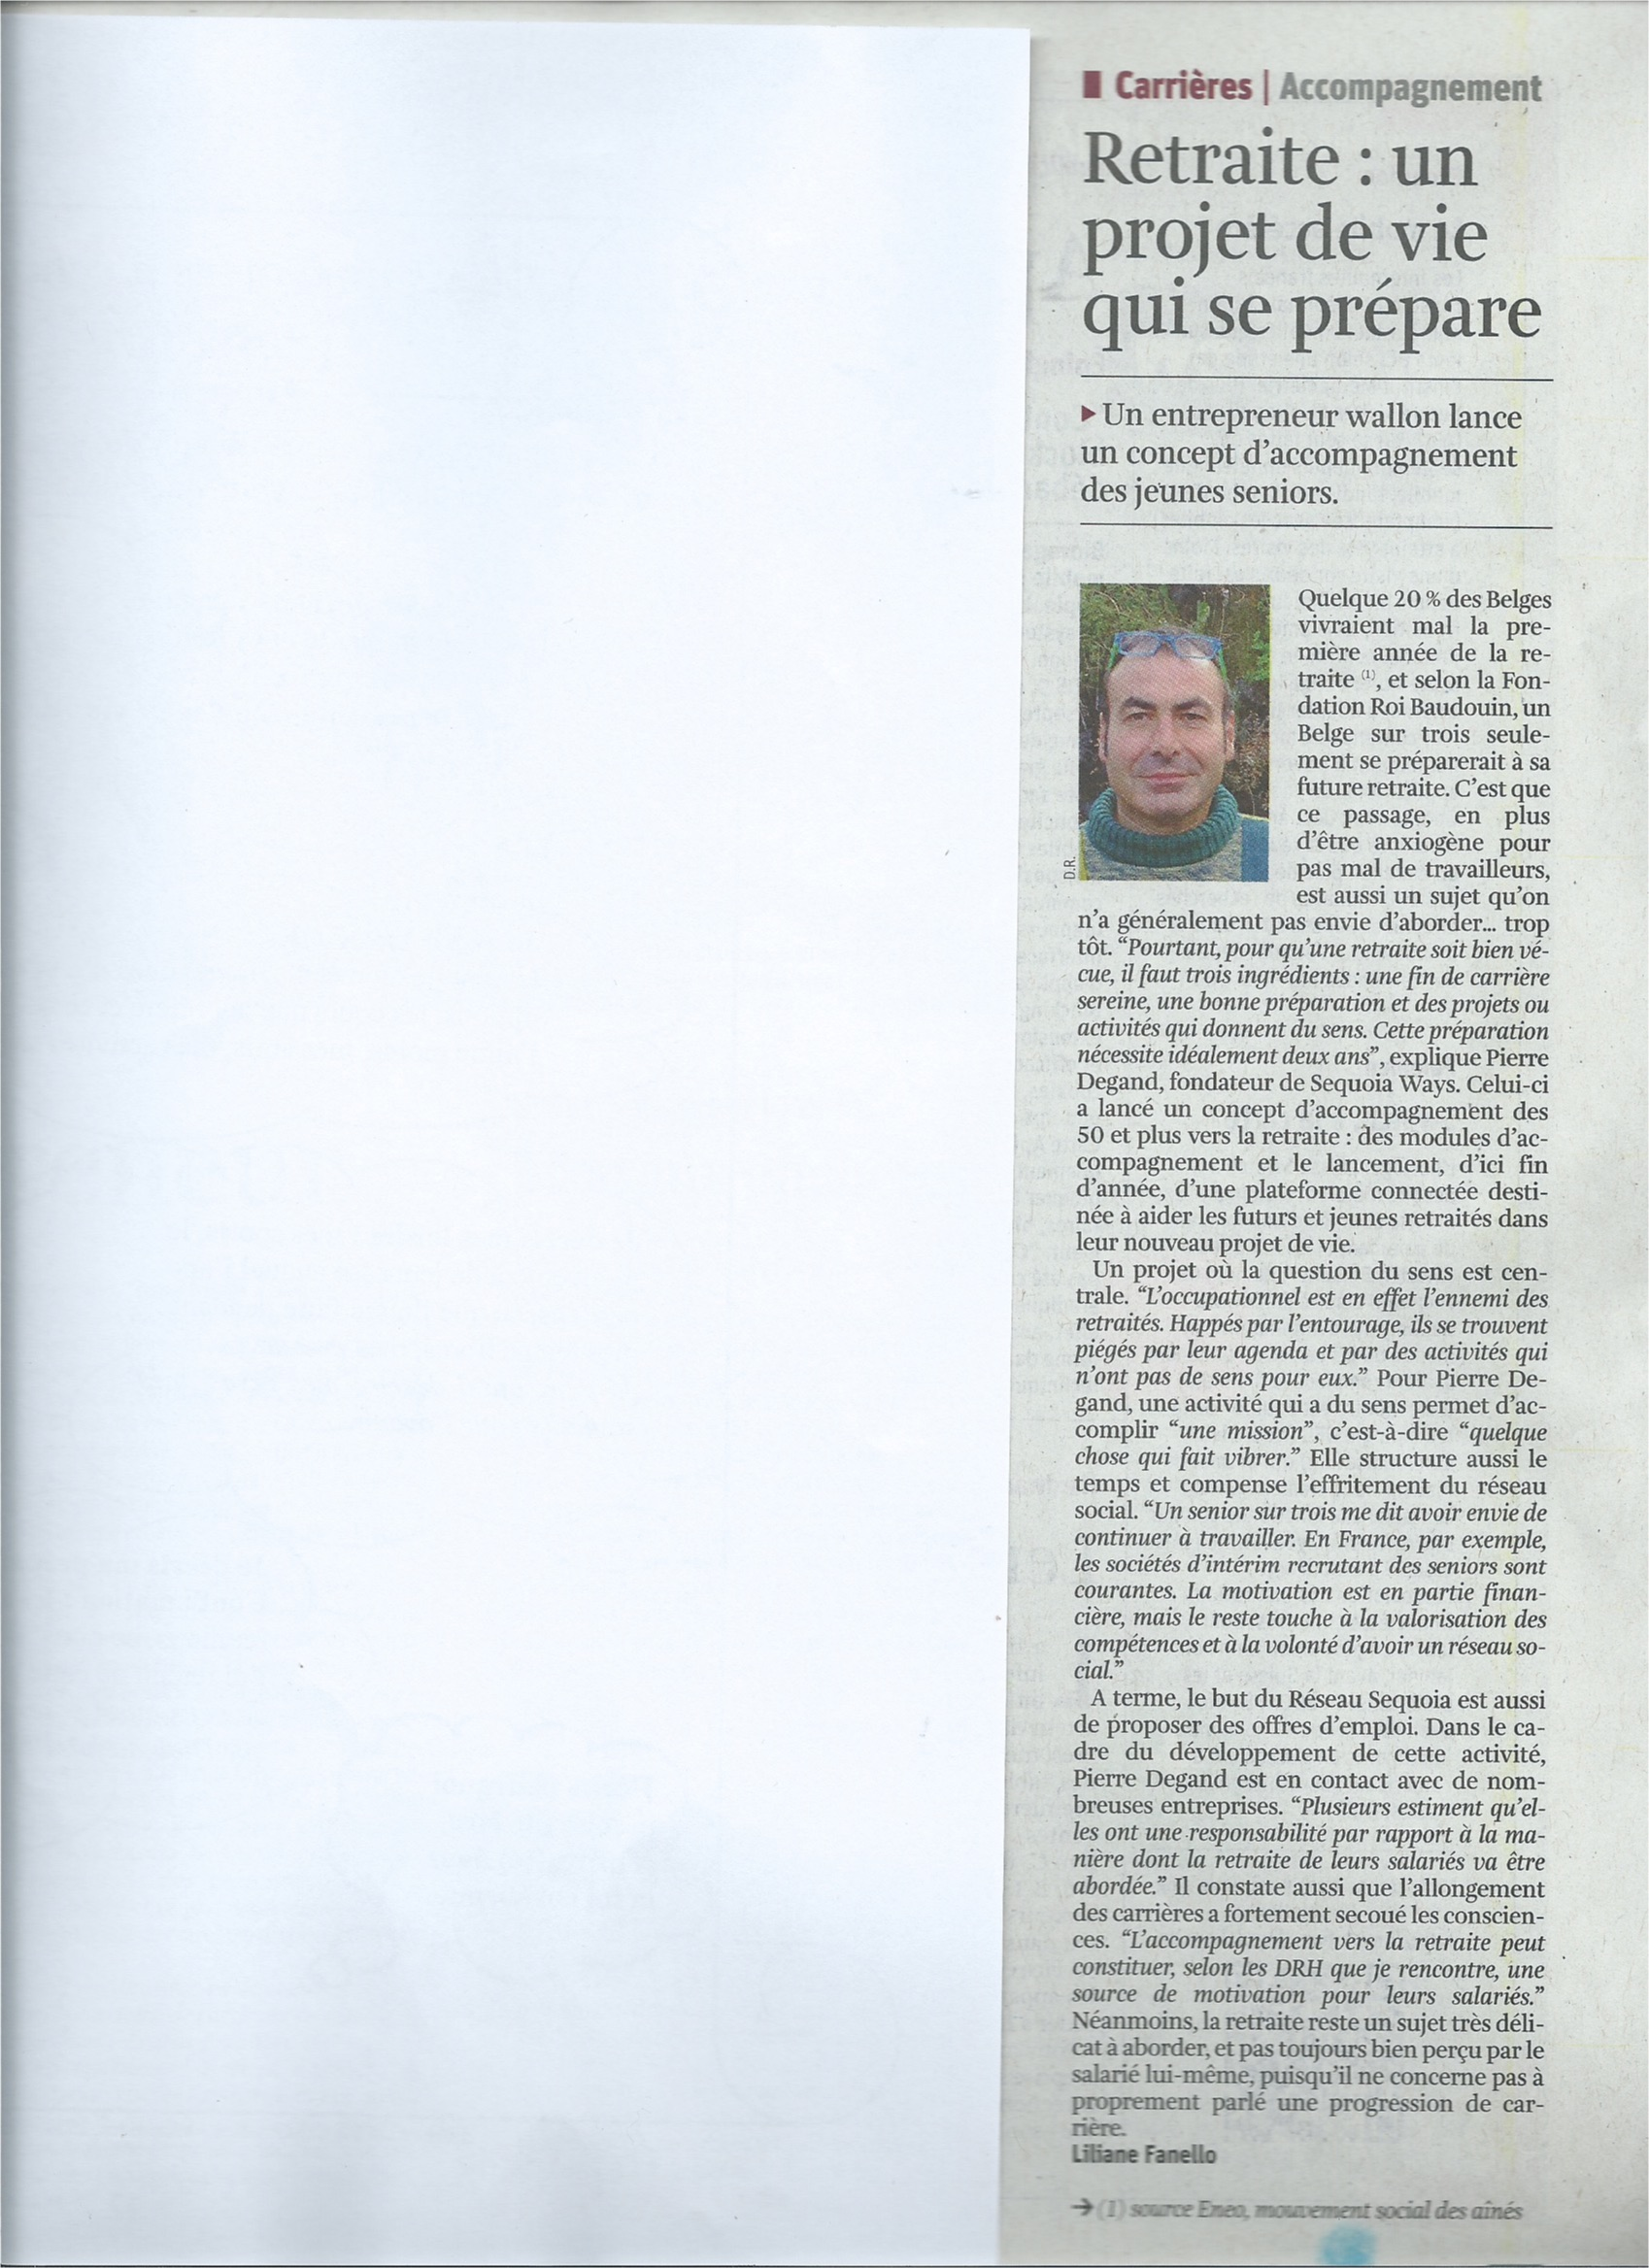 Sequoia Ways La Libre Entreprise 17 octobre 2015